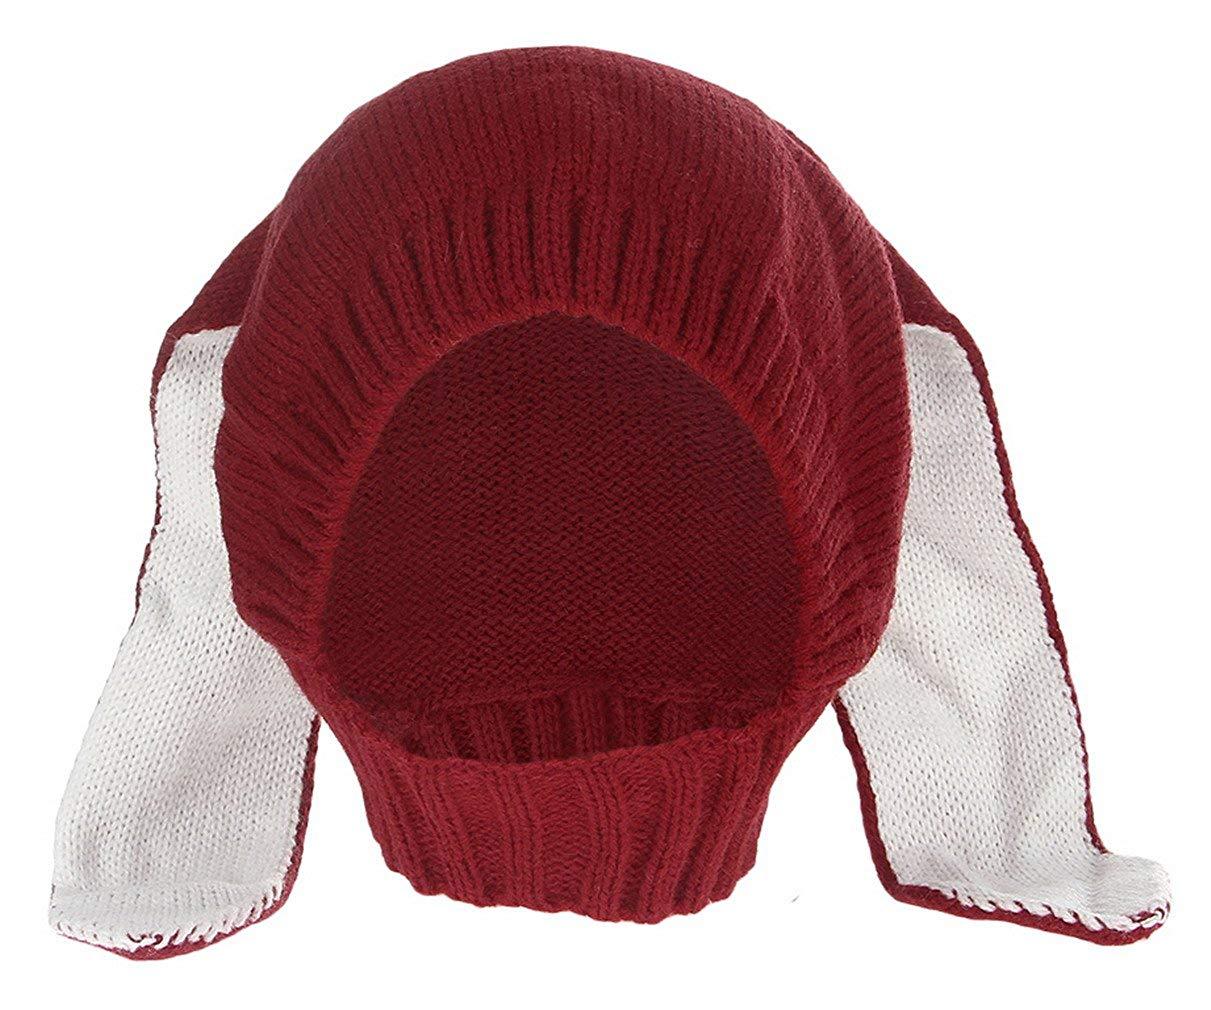 2b23f92249b Get Quotations · La Vogue Baby Cute ear Hats Winter Crochet Earmuff Earcap Knit  Hat